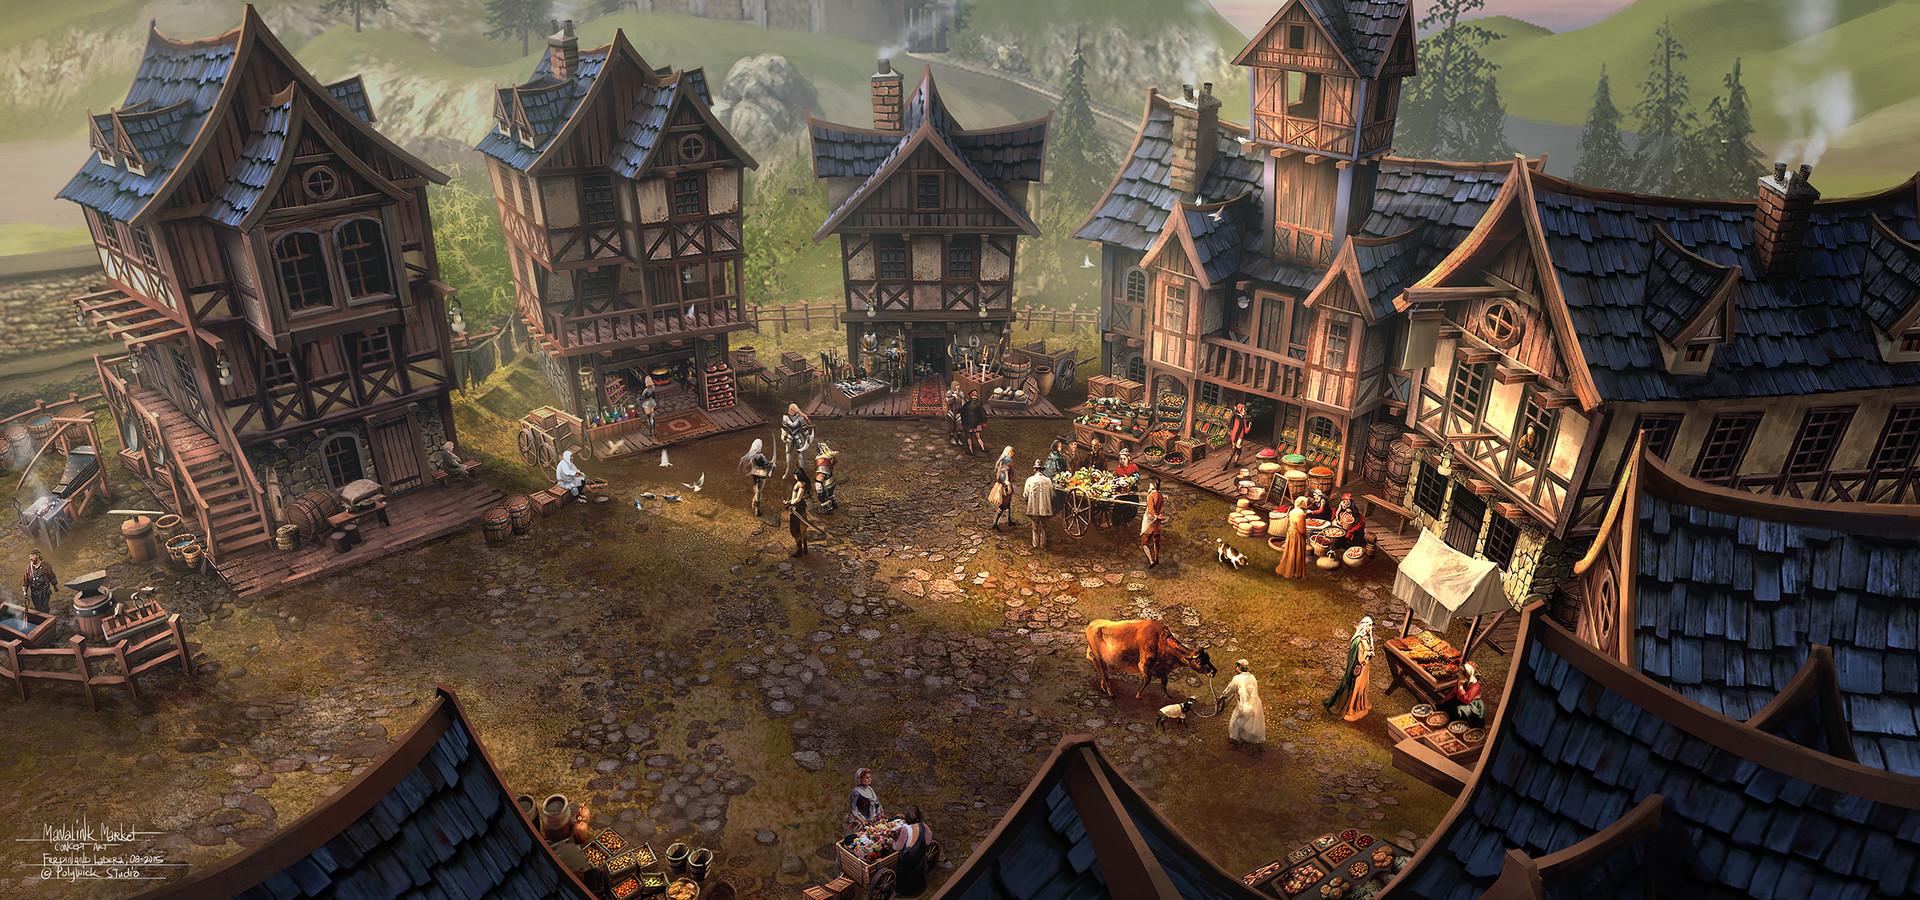 Ferdinand ladera manalink market